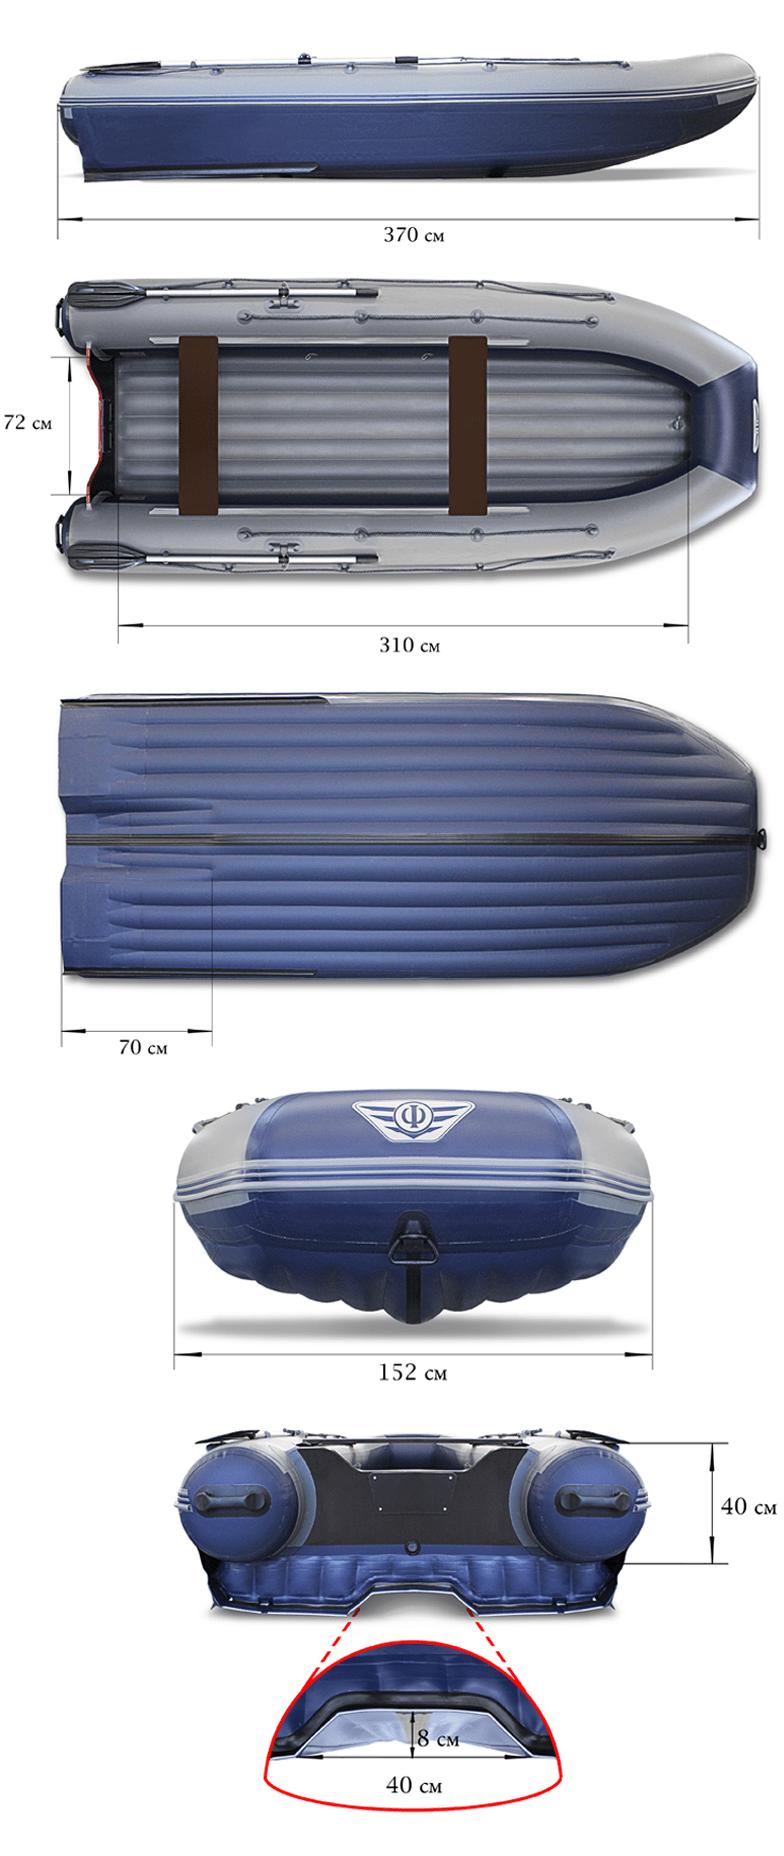 ФЛАГМАН DK 370i Jet